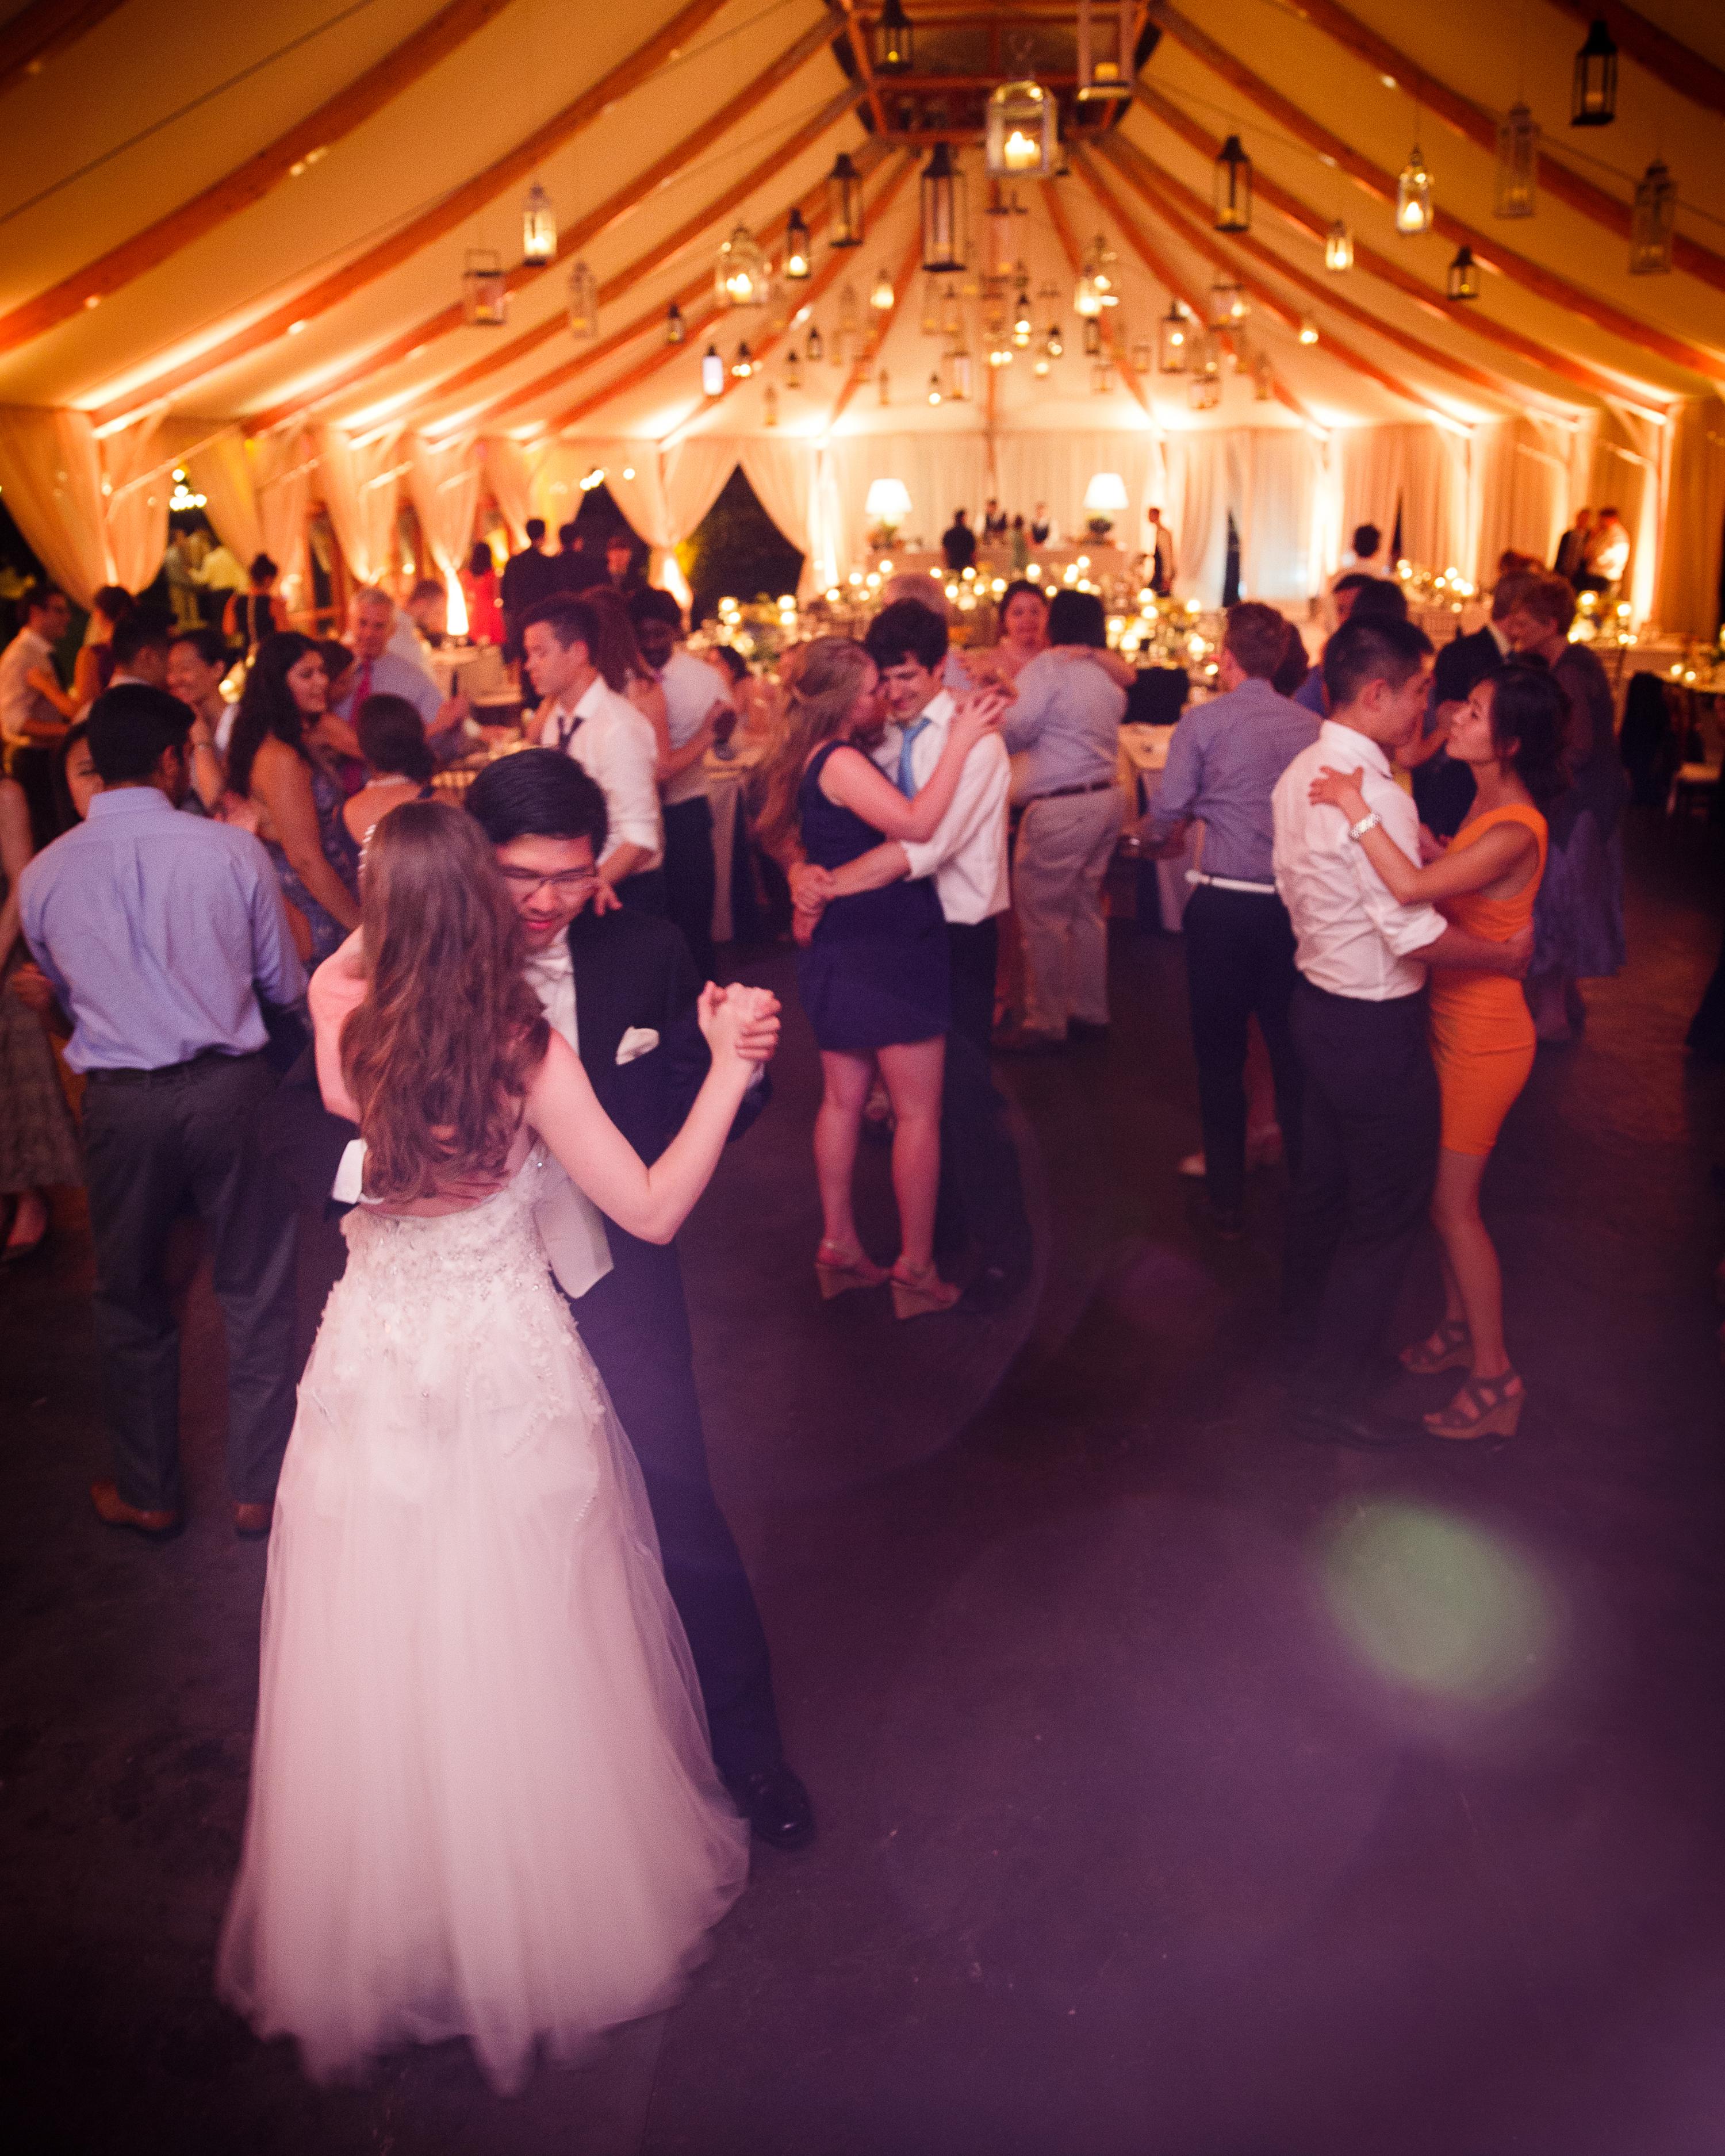 kristel-austin-wedding-dancing-40-s11860-0415.jpg